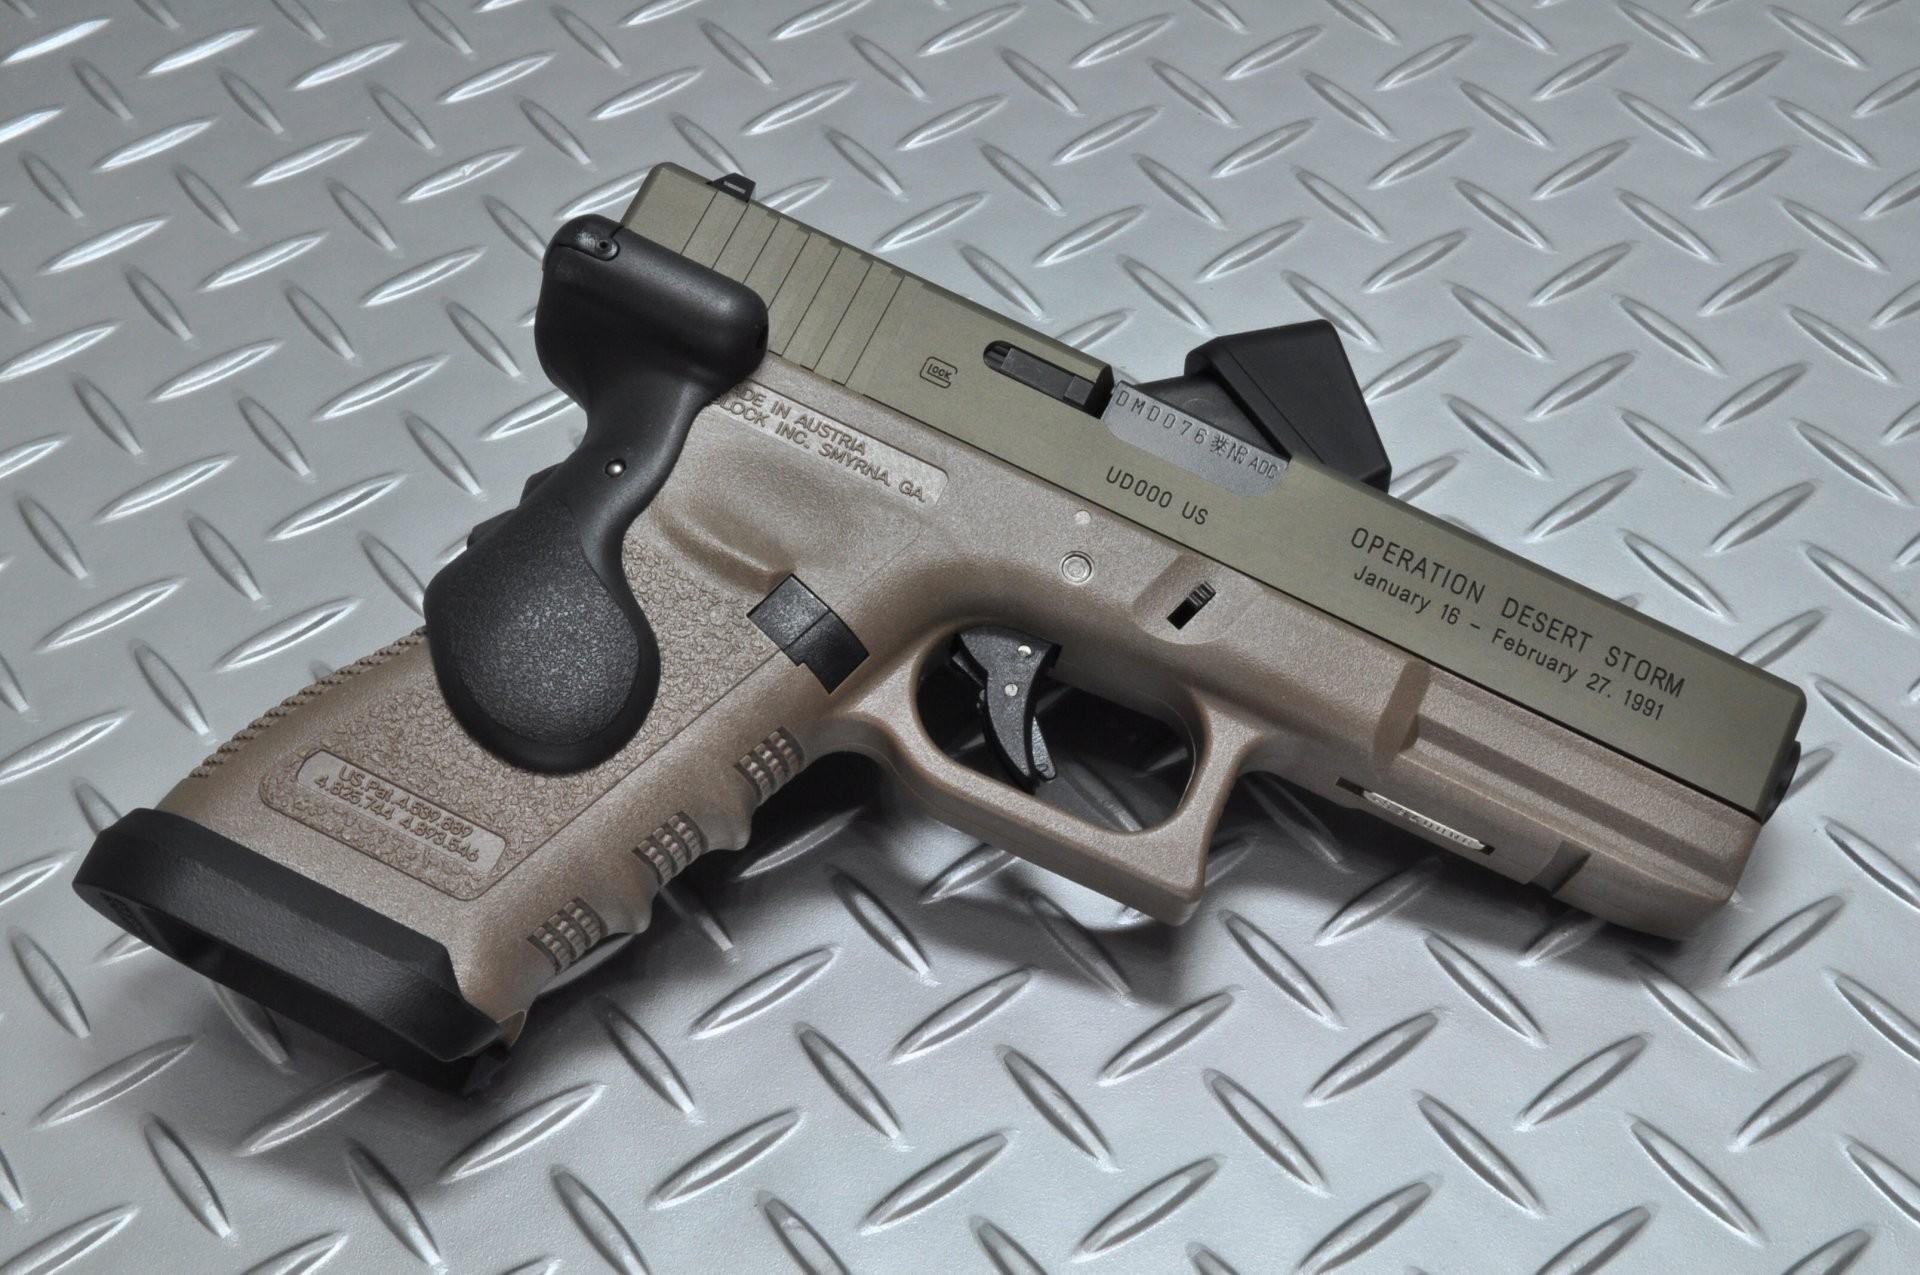 glock self-loading gun weapon background